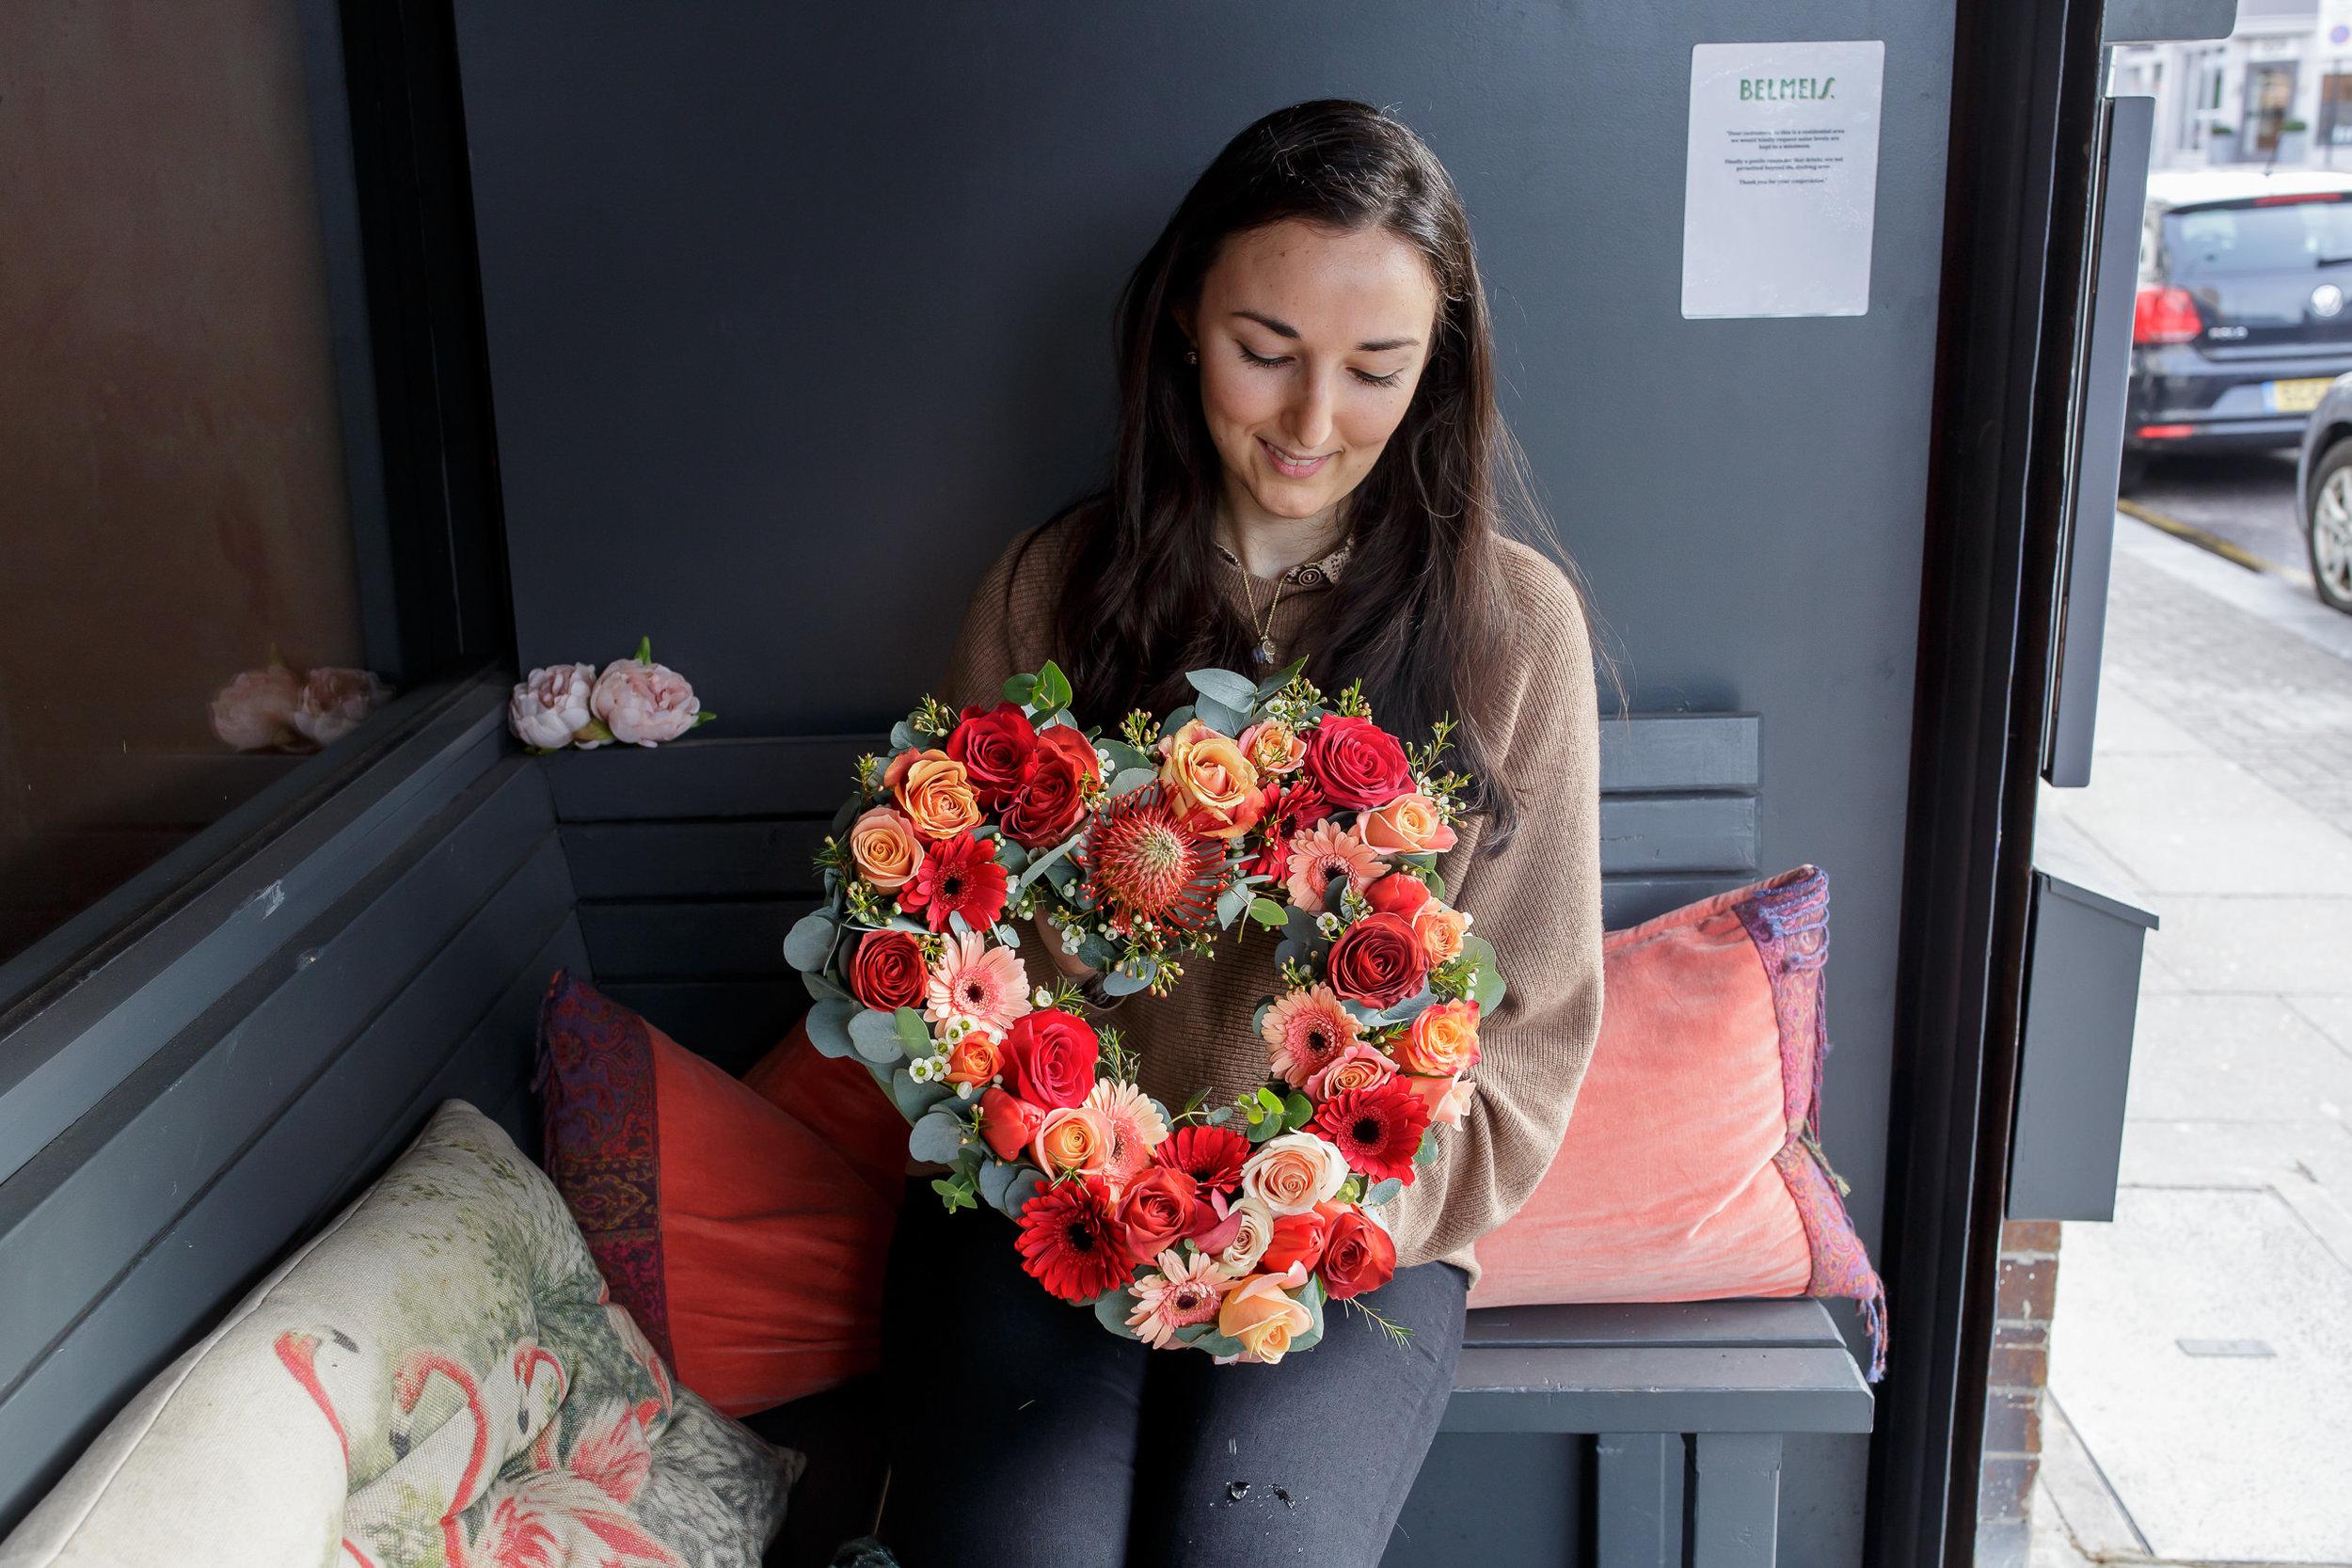 Bilen-Floral-Workshop-83.jpg